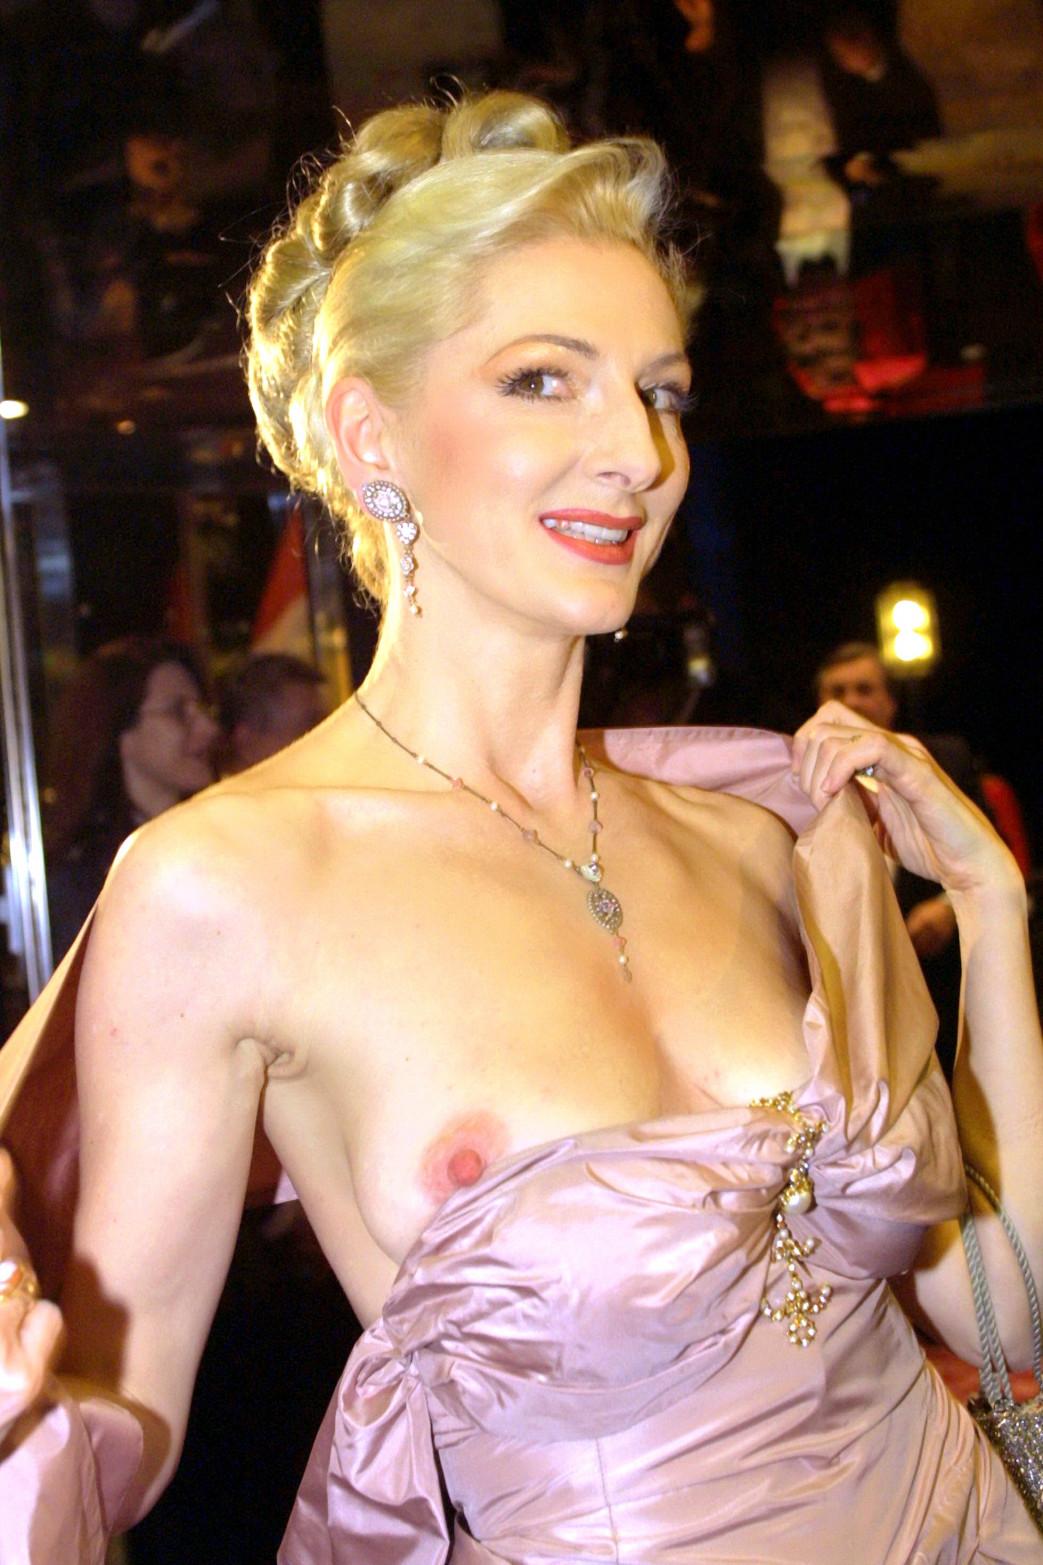 Desiree-Nick-Boob-Slip-at-unesco-benefiz-gala-2001-10.jpg